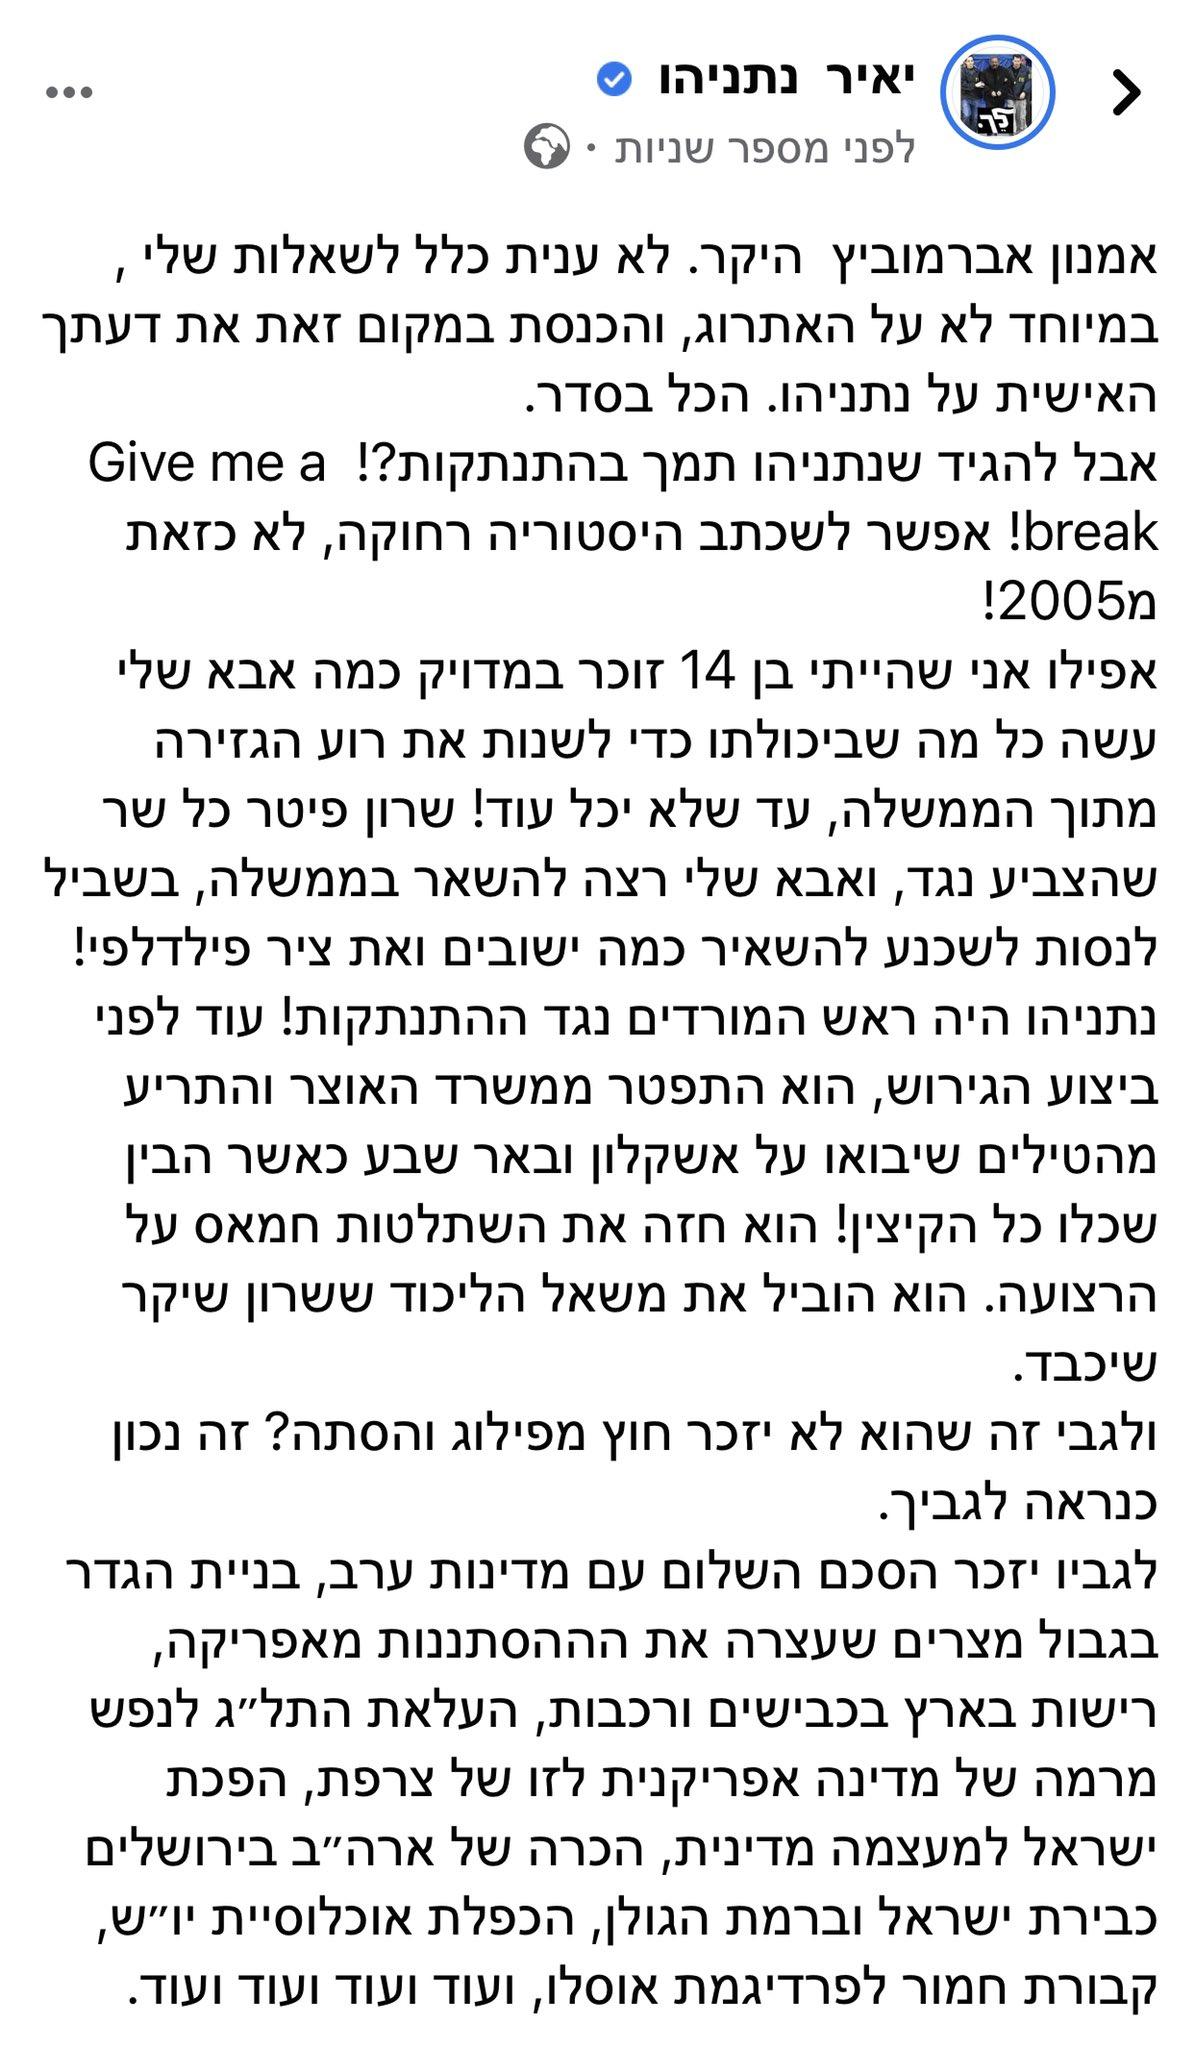 Yair Netanyahu On Twitter תשובתי לתשובה של אמנון אברמוביץ